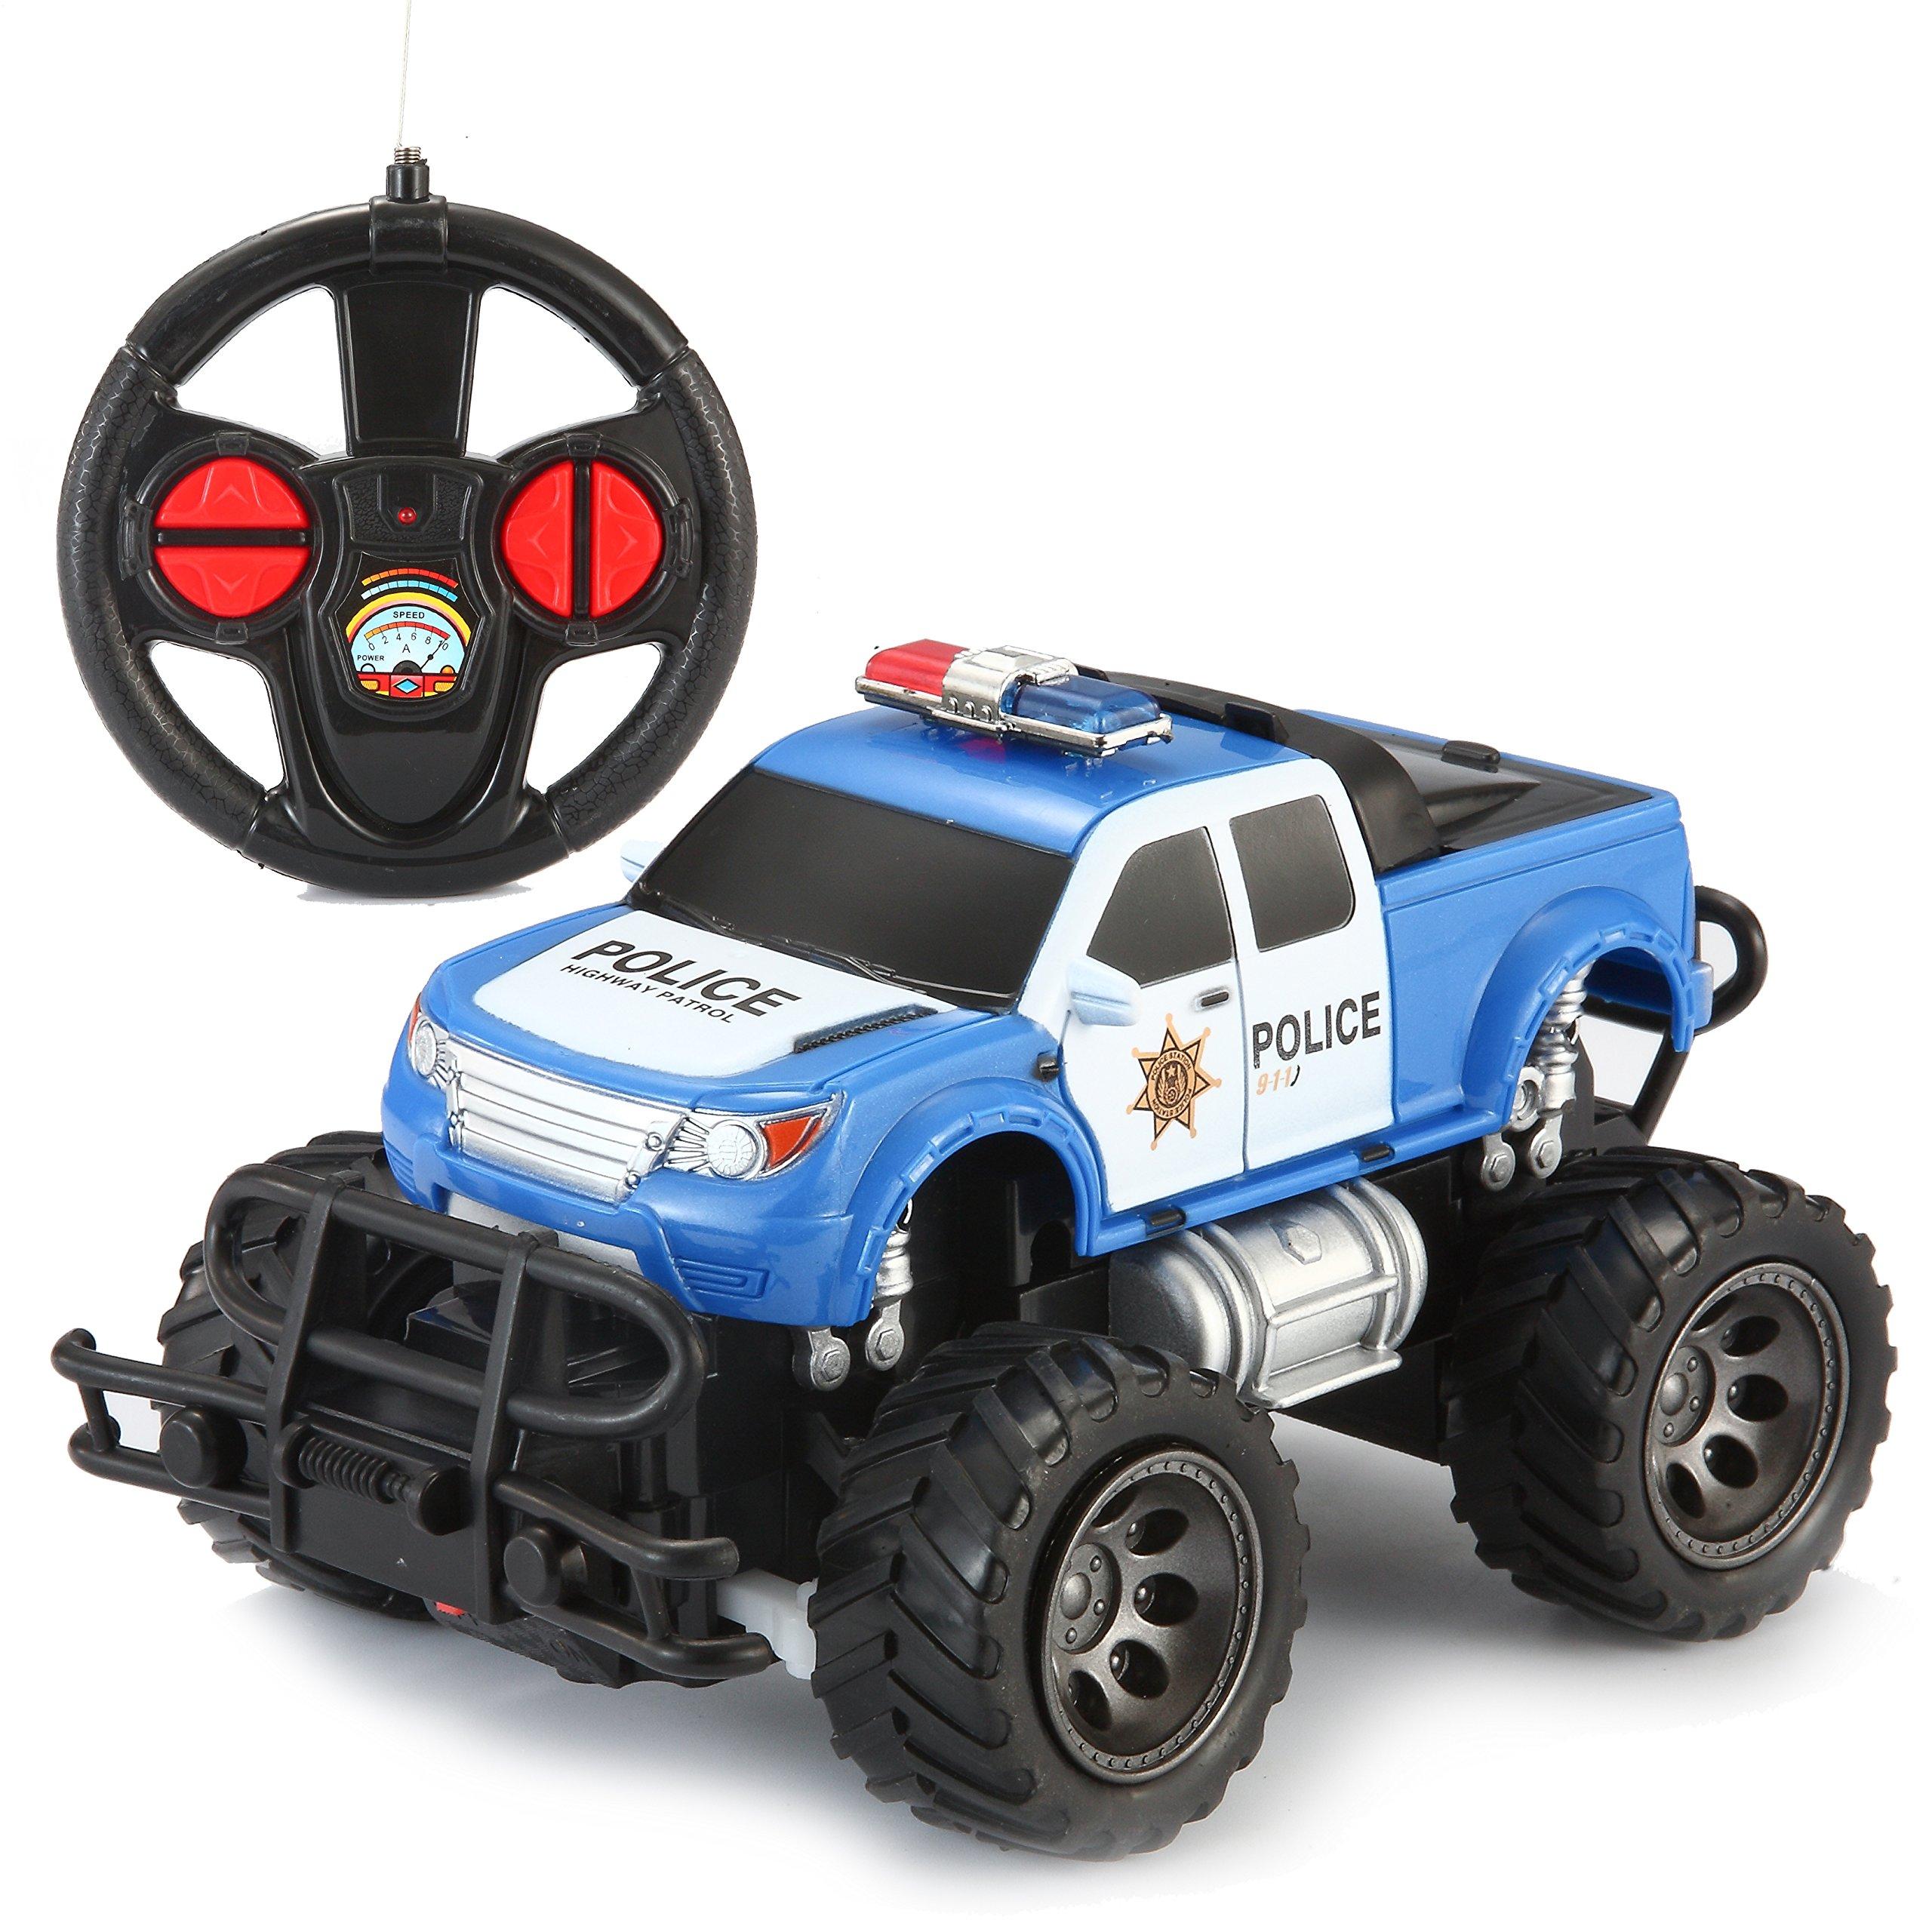 Joyin Toy Rc Remote Control Police Car Monster Truck Radio Control Kids Police Toy Cars Amazon Com Au Toys Games